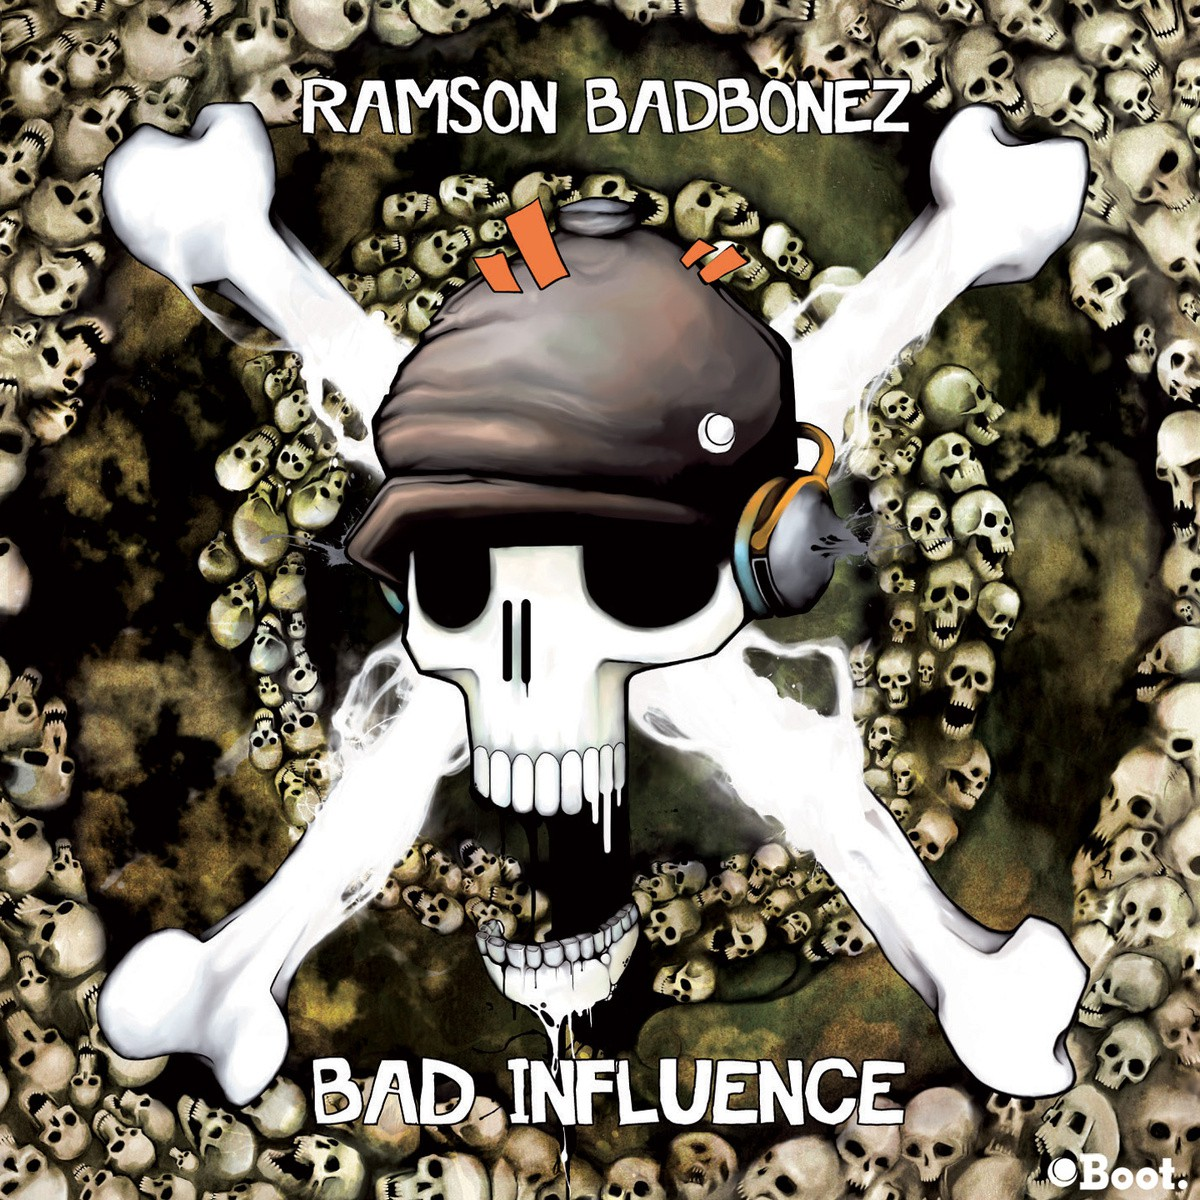 Ramson Badbonez - Bad Influence